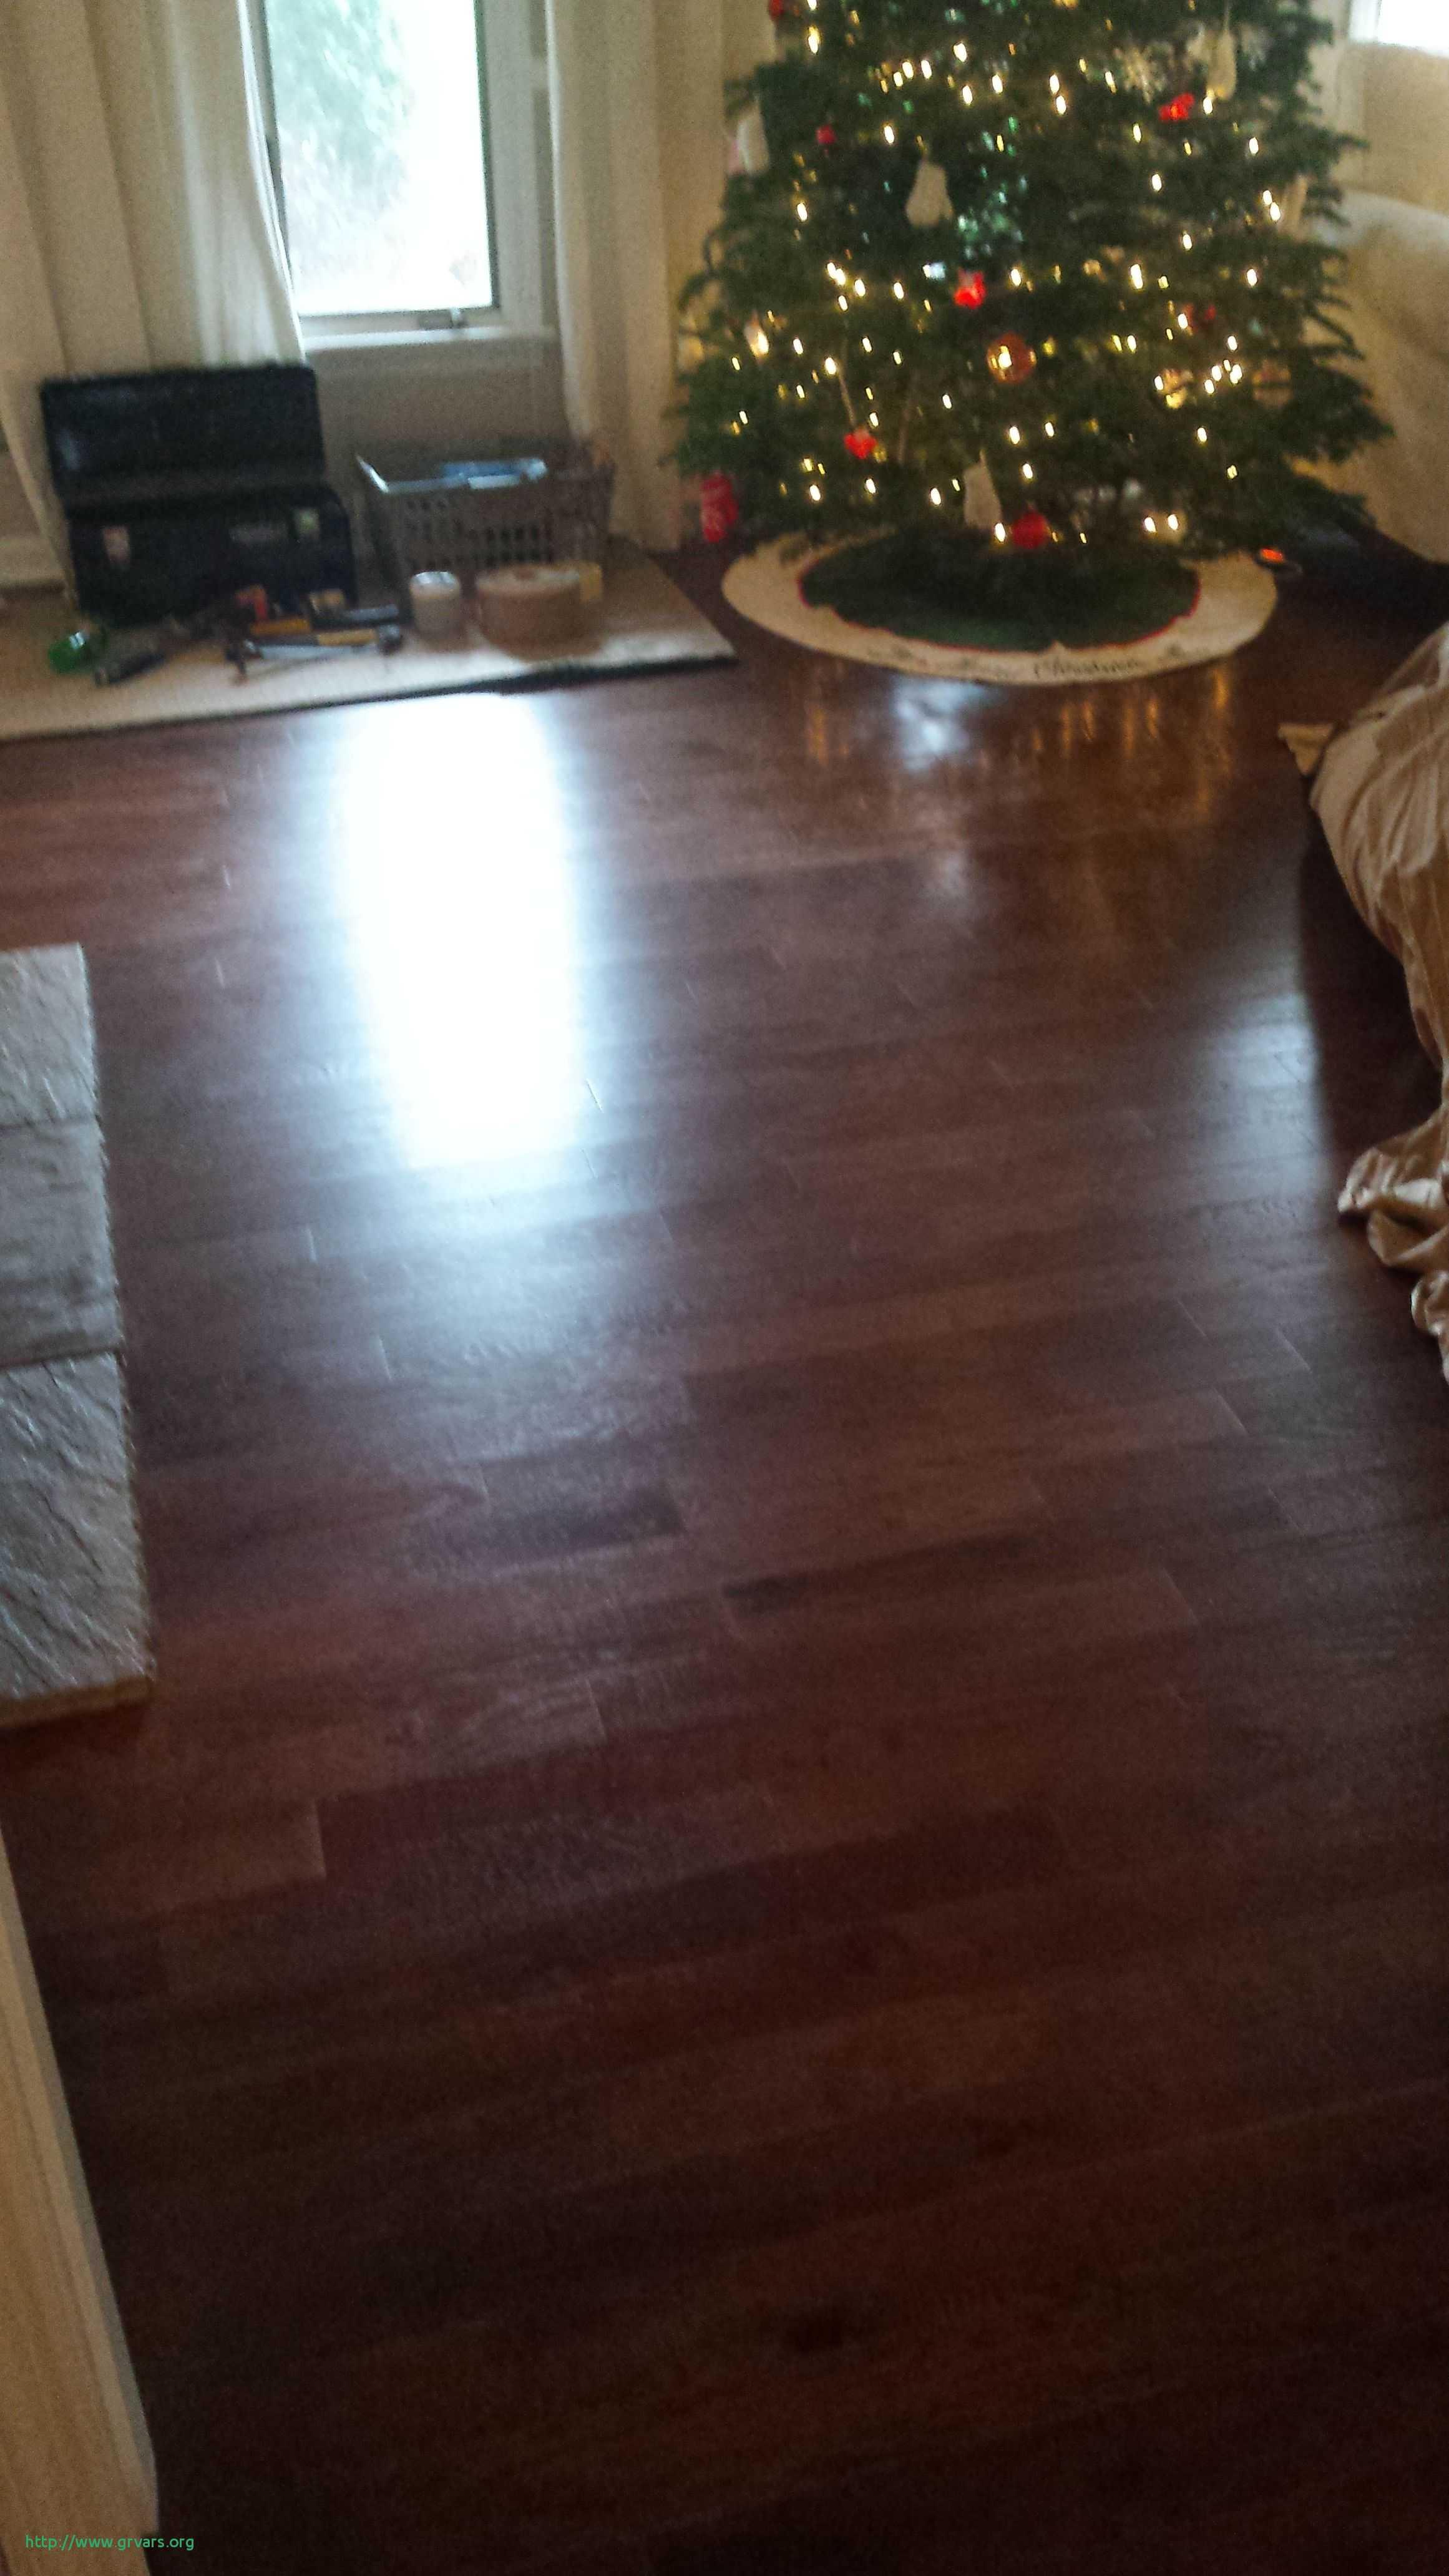 hardwood flooring wholesale georgia of 16 charmant columbus flooring and more ideas blog intended for columbus flooring and more impressionnant pin by home based carpet flooring llc on hardwood